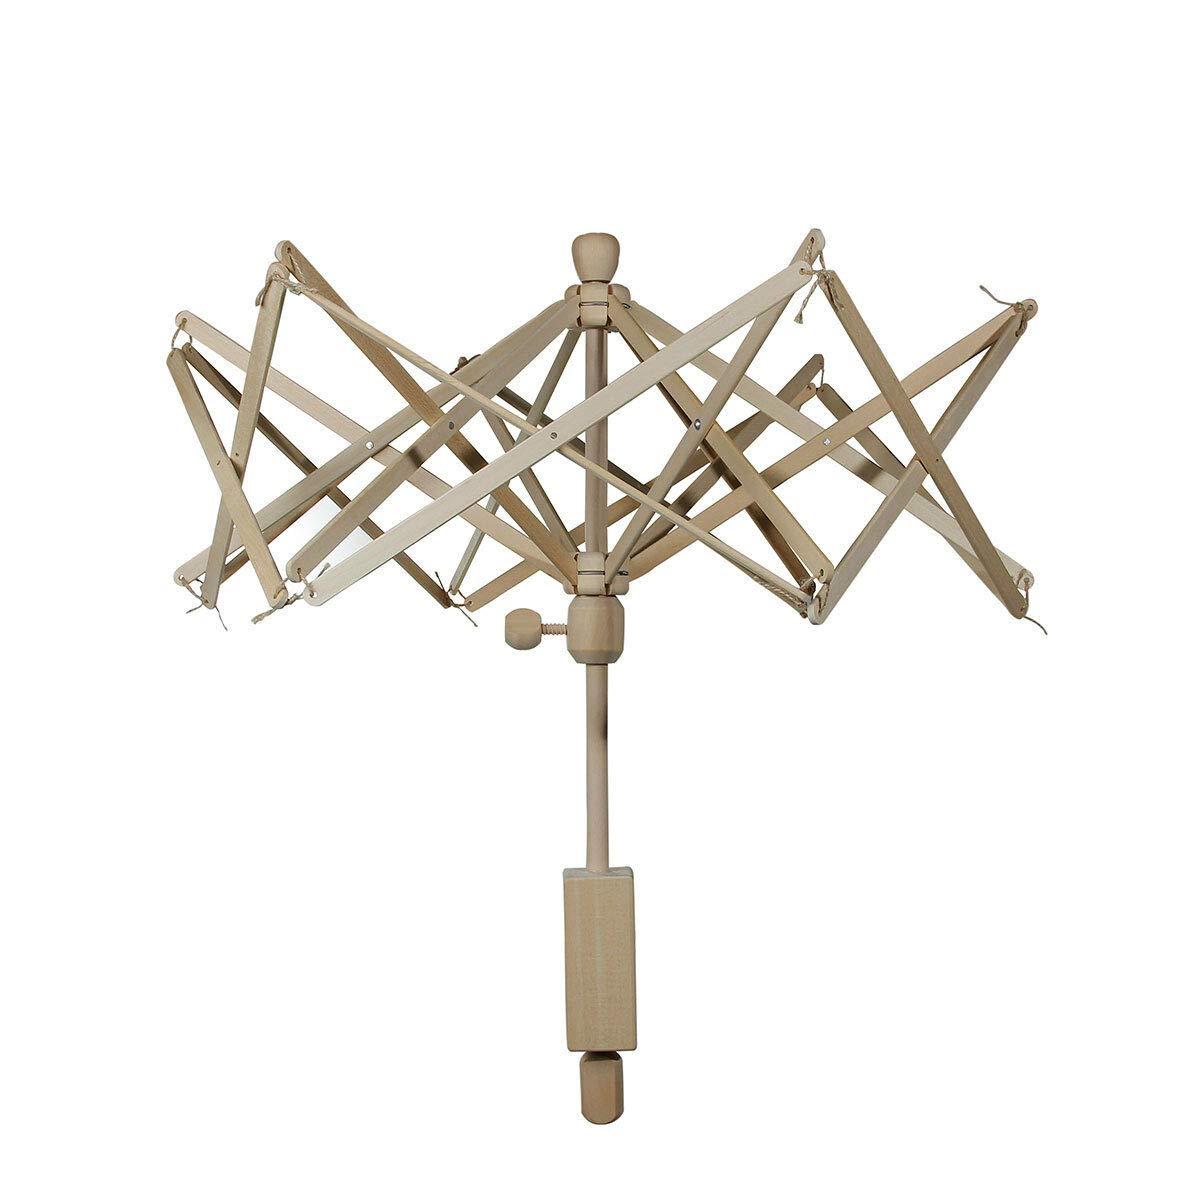 FidgetKute Umbrella 24'' New Wooden(Birch) Swift Yarn Winder Holder Knitting Machine 1 pc